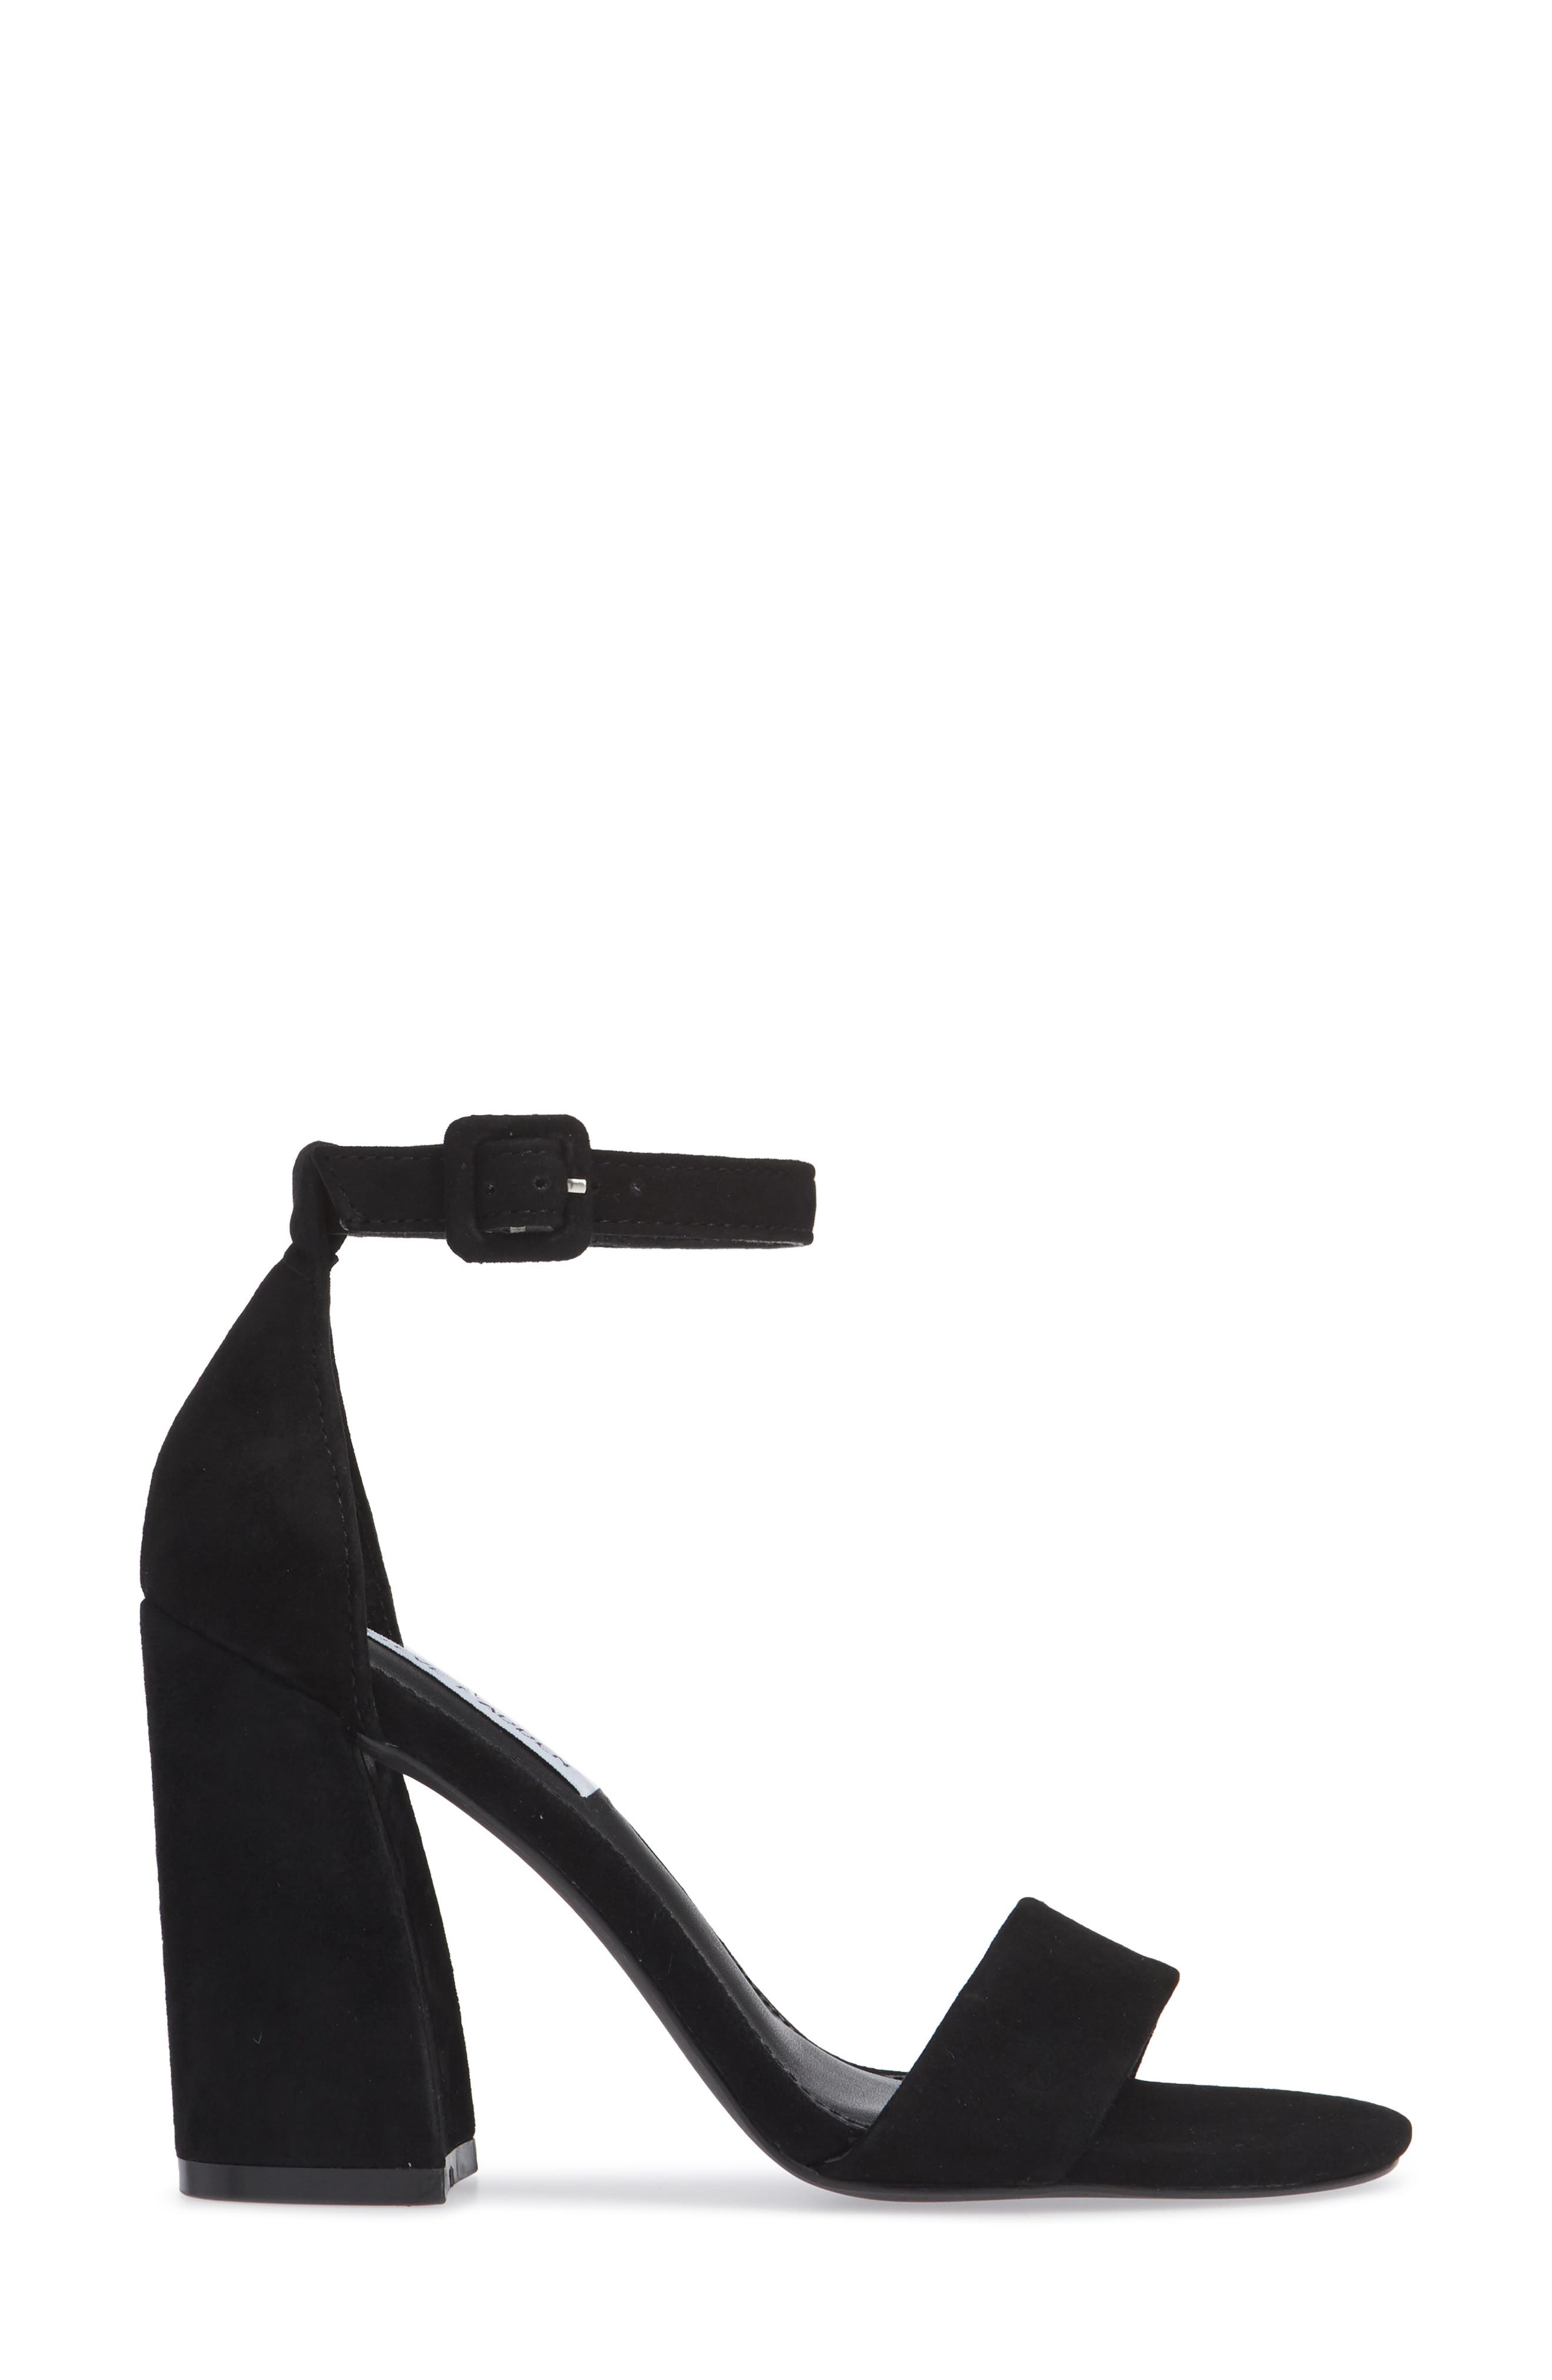 Joss Ankle Strap Sandal,                             Alternate thumbnail 3, color,                             BLACK SUEDE